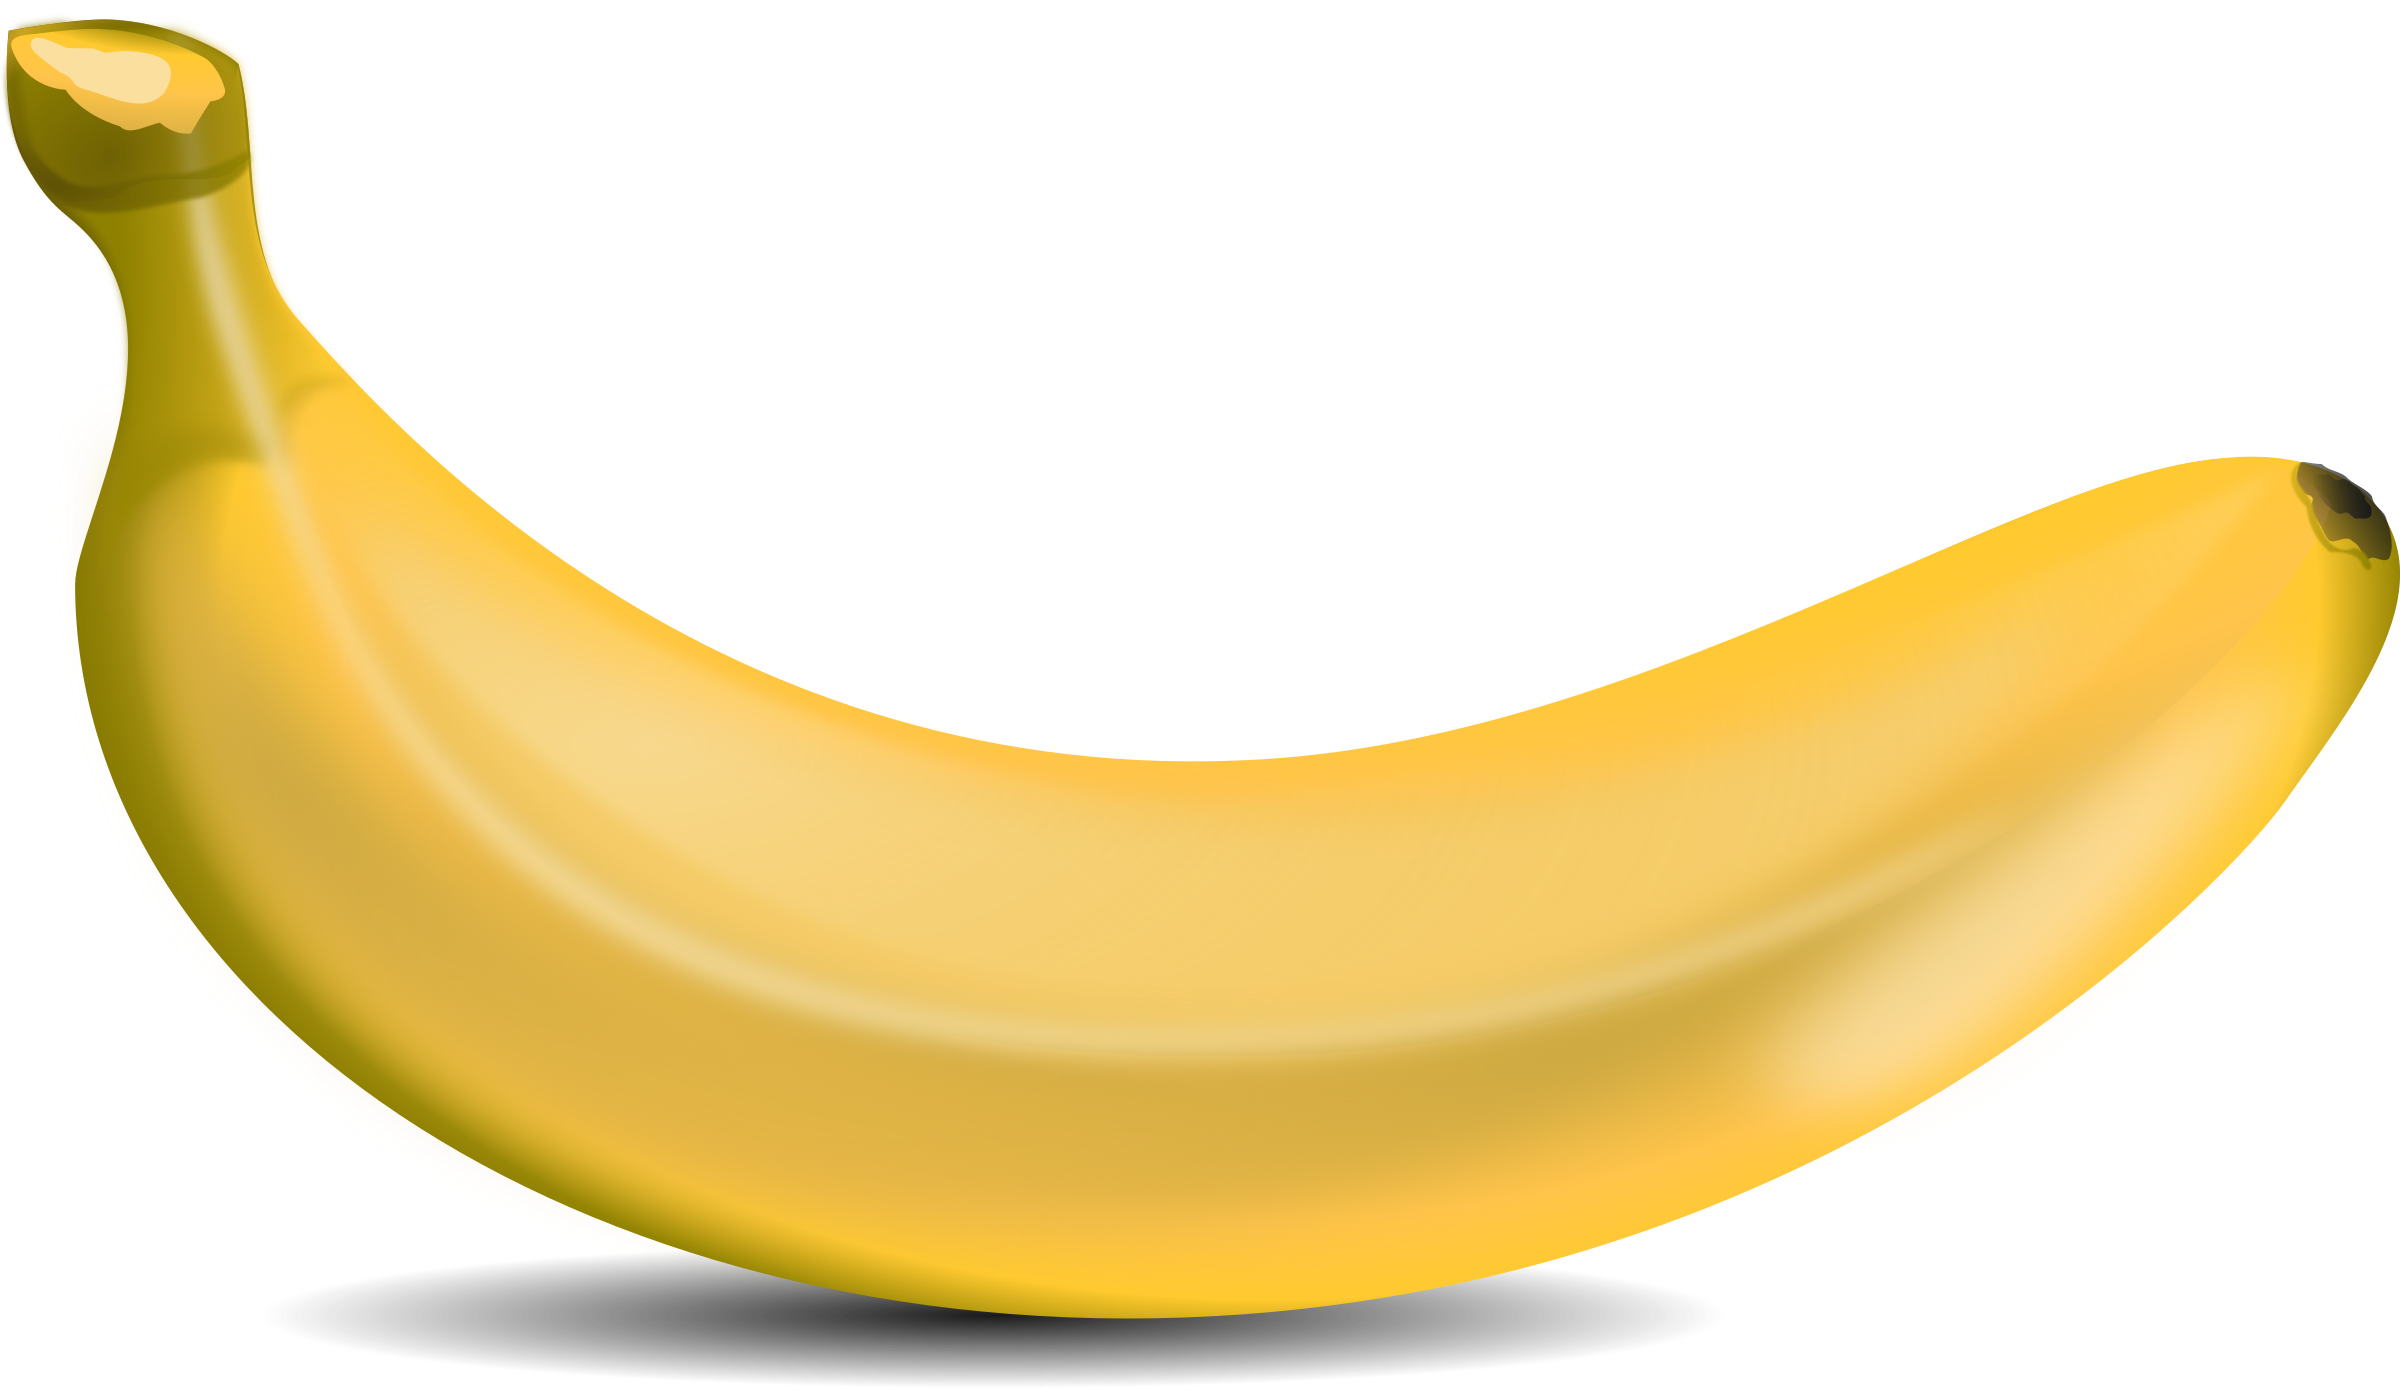 Banana background clipart